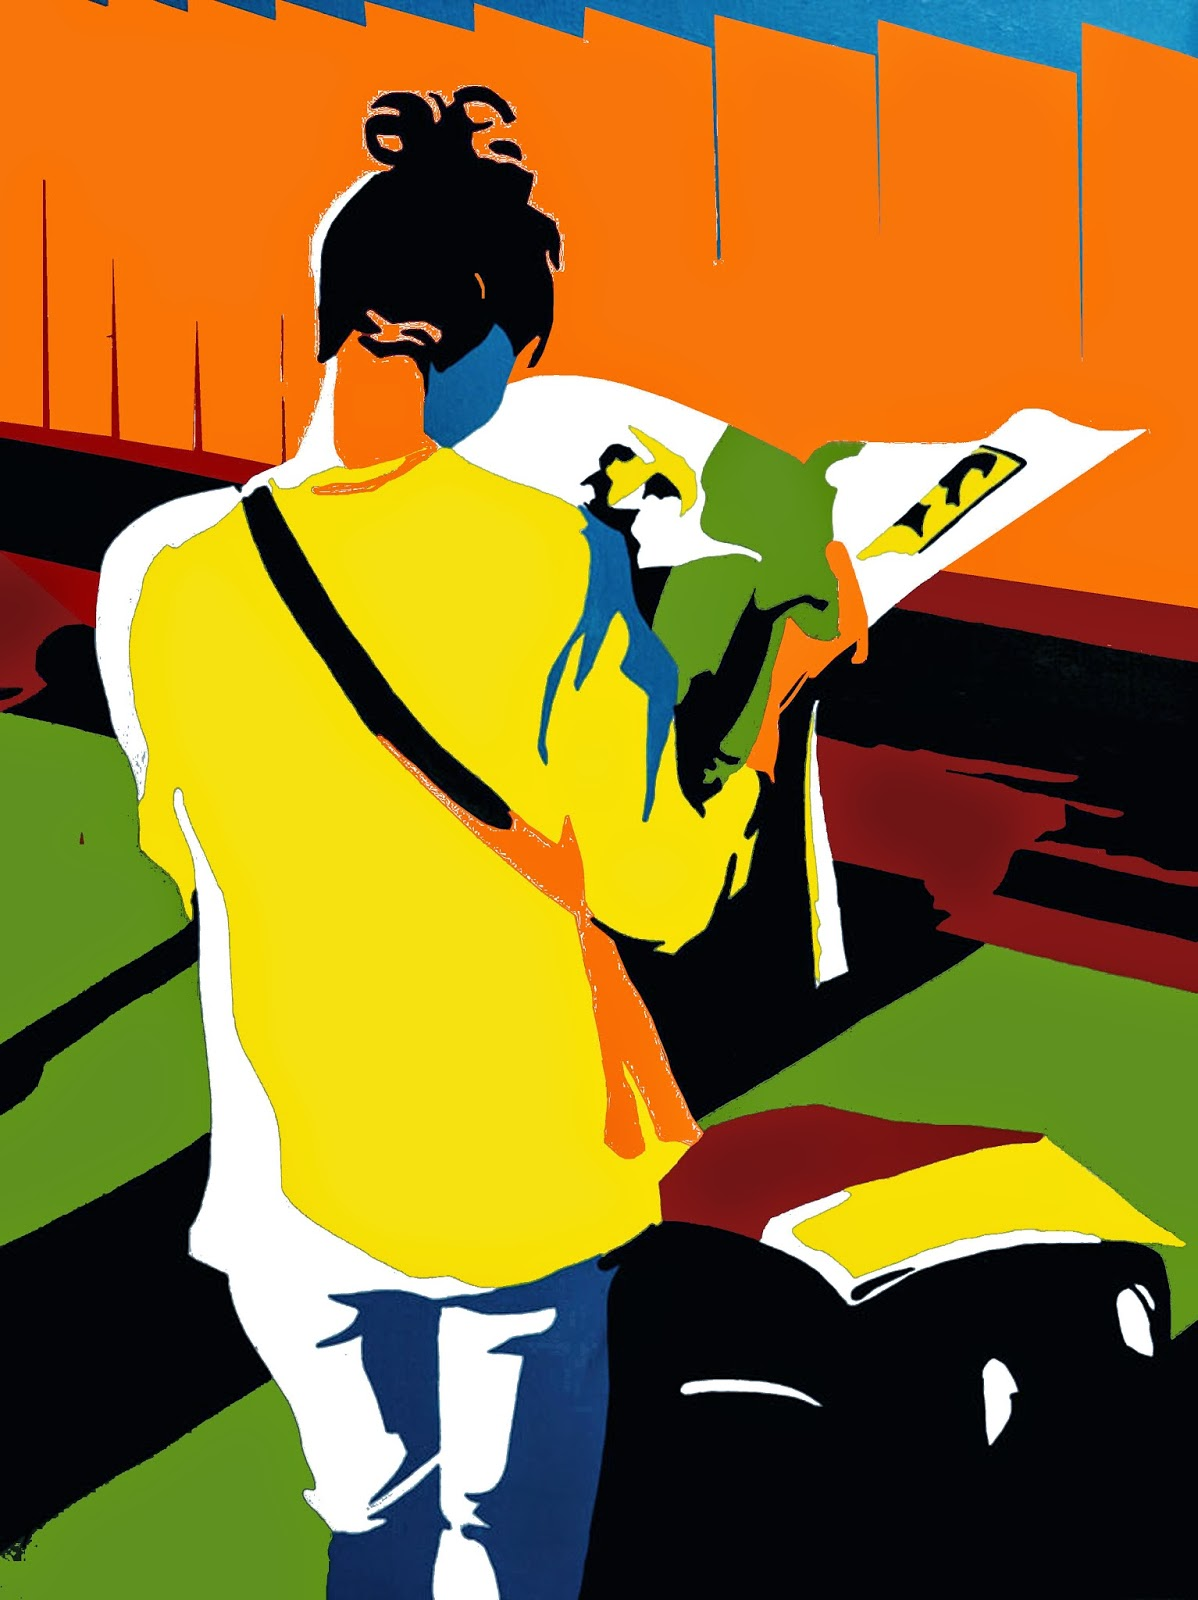 Art by Artist Devajyoti Ray profiled on Art Scene India, Image courtesy artist